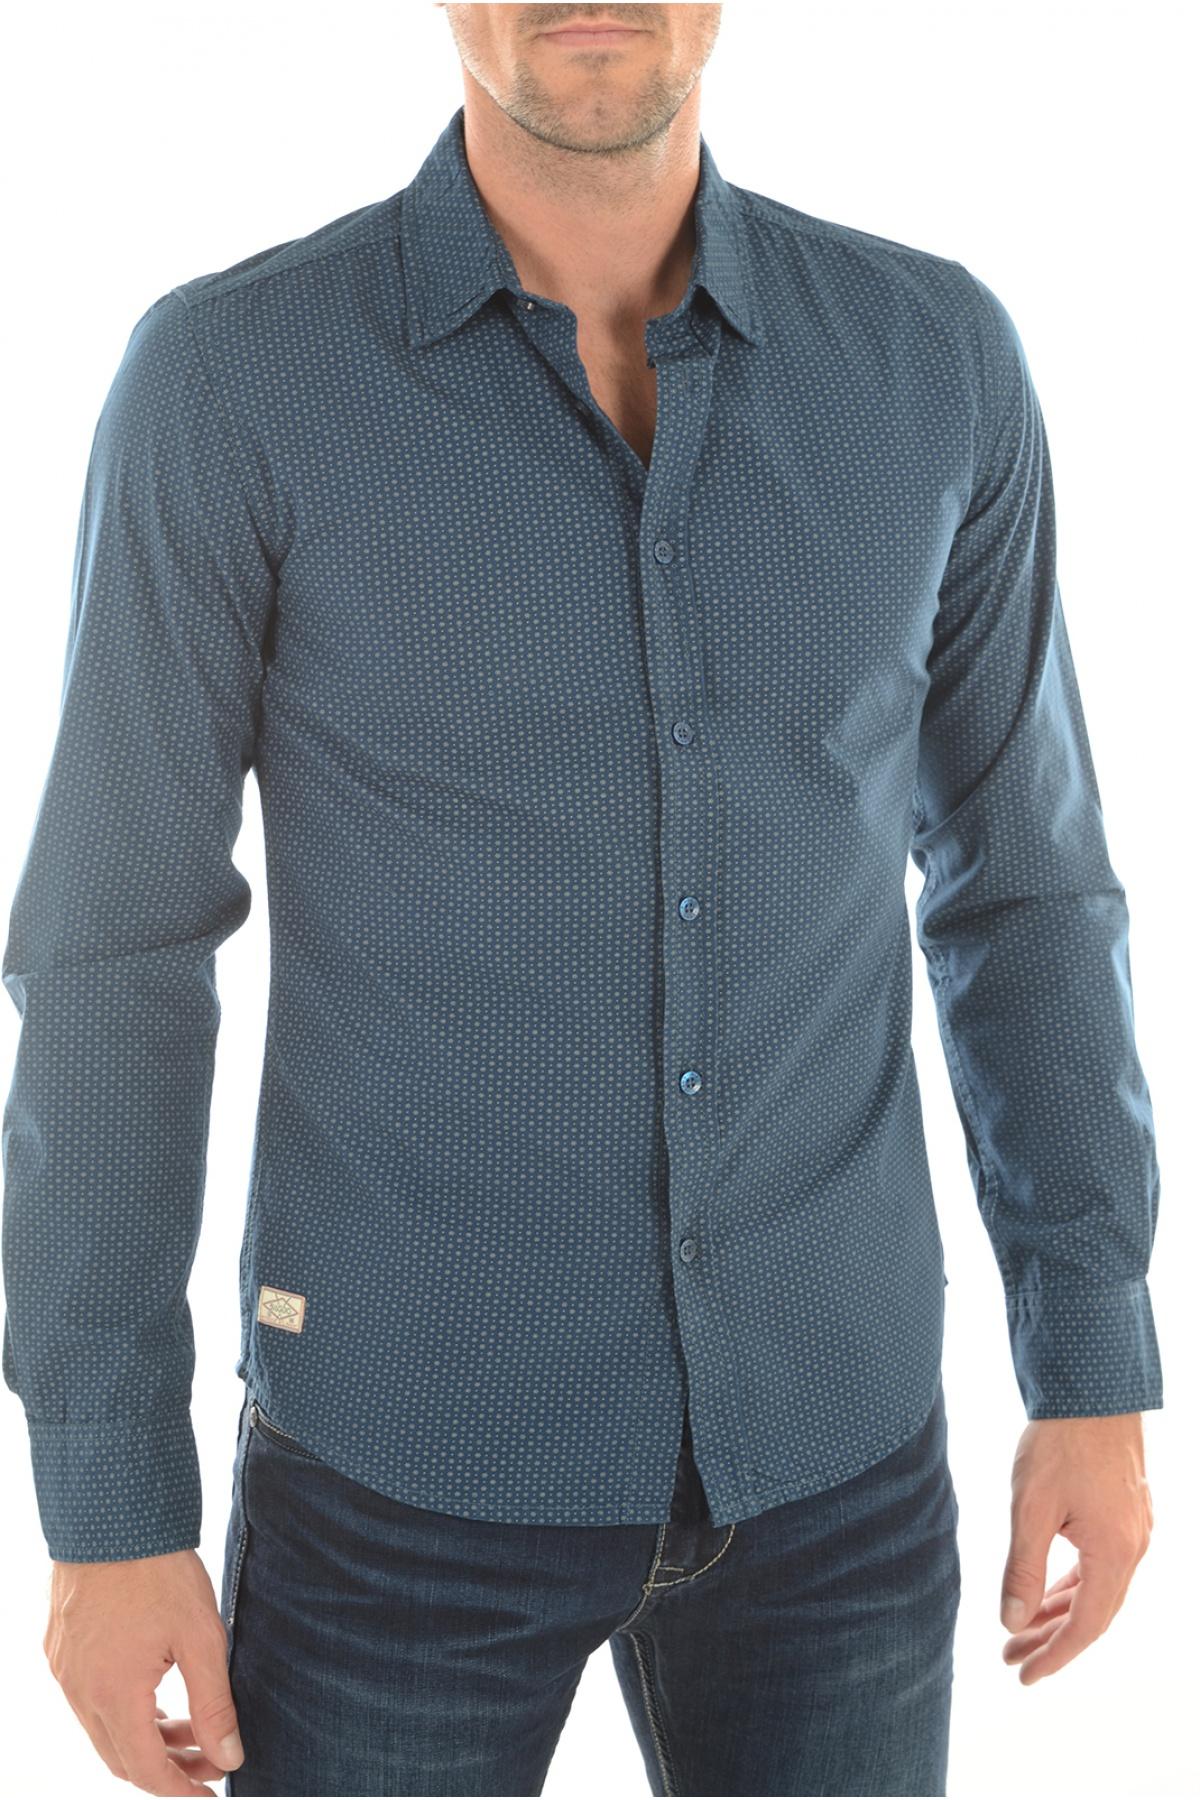 Chemise Printée Cudila - Biaggio Jeans